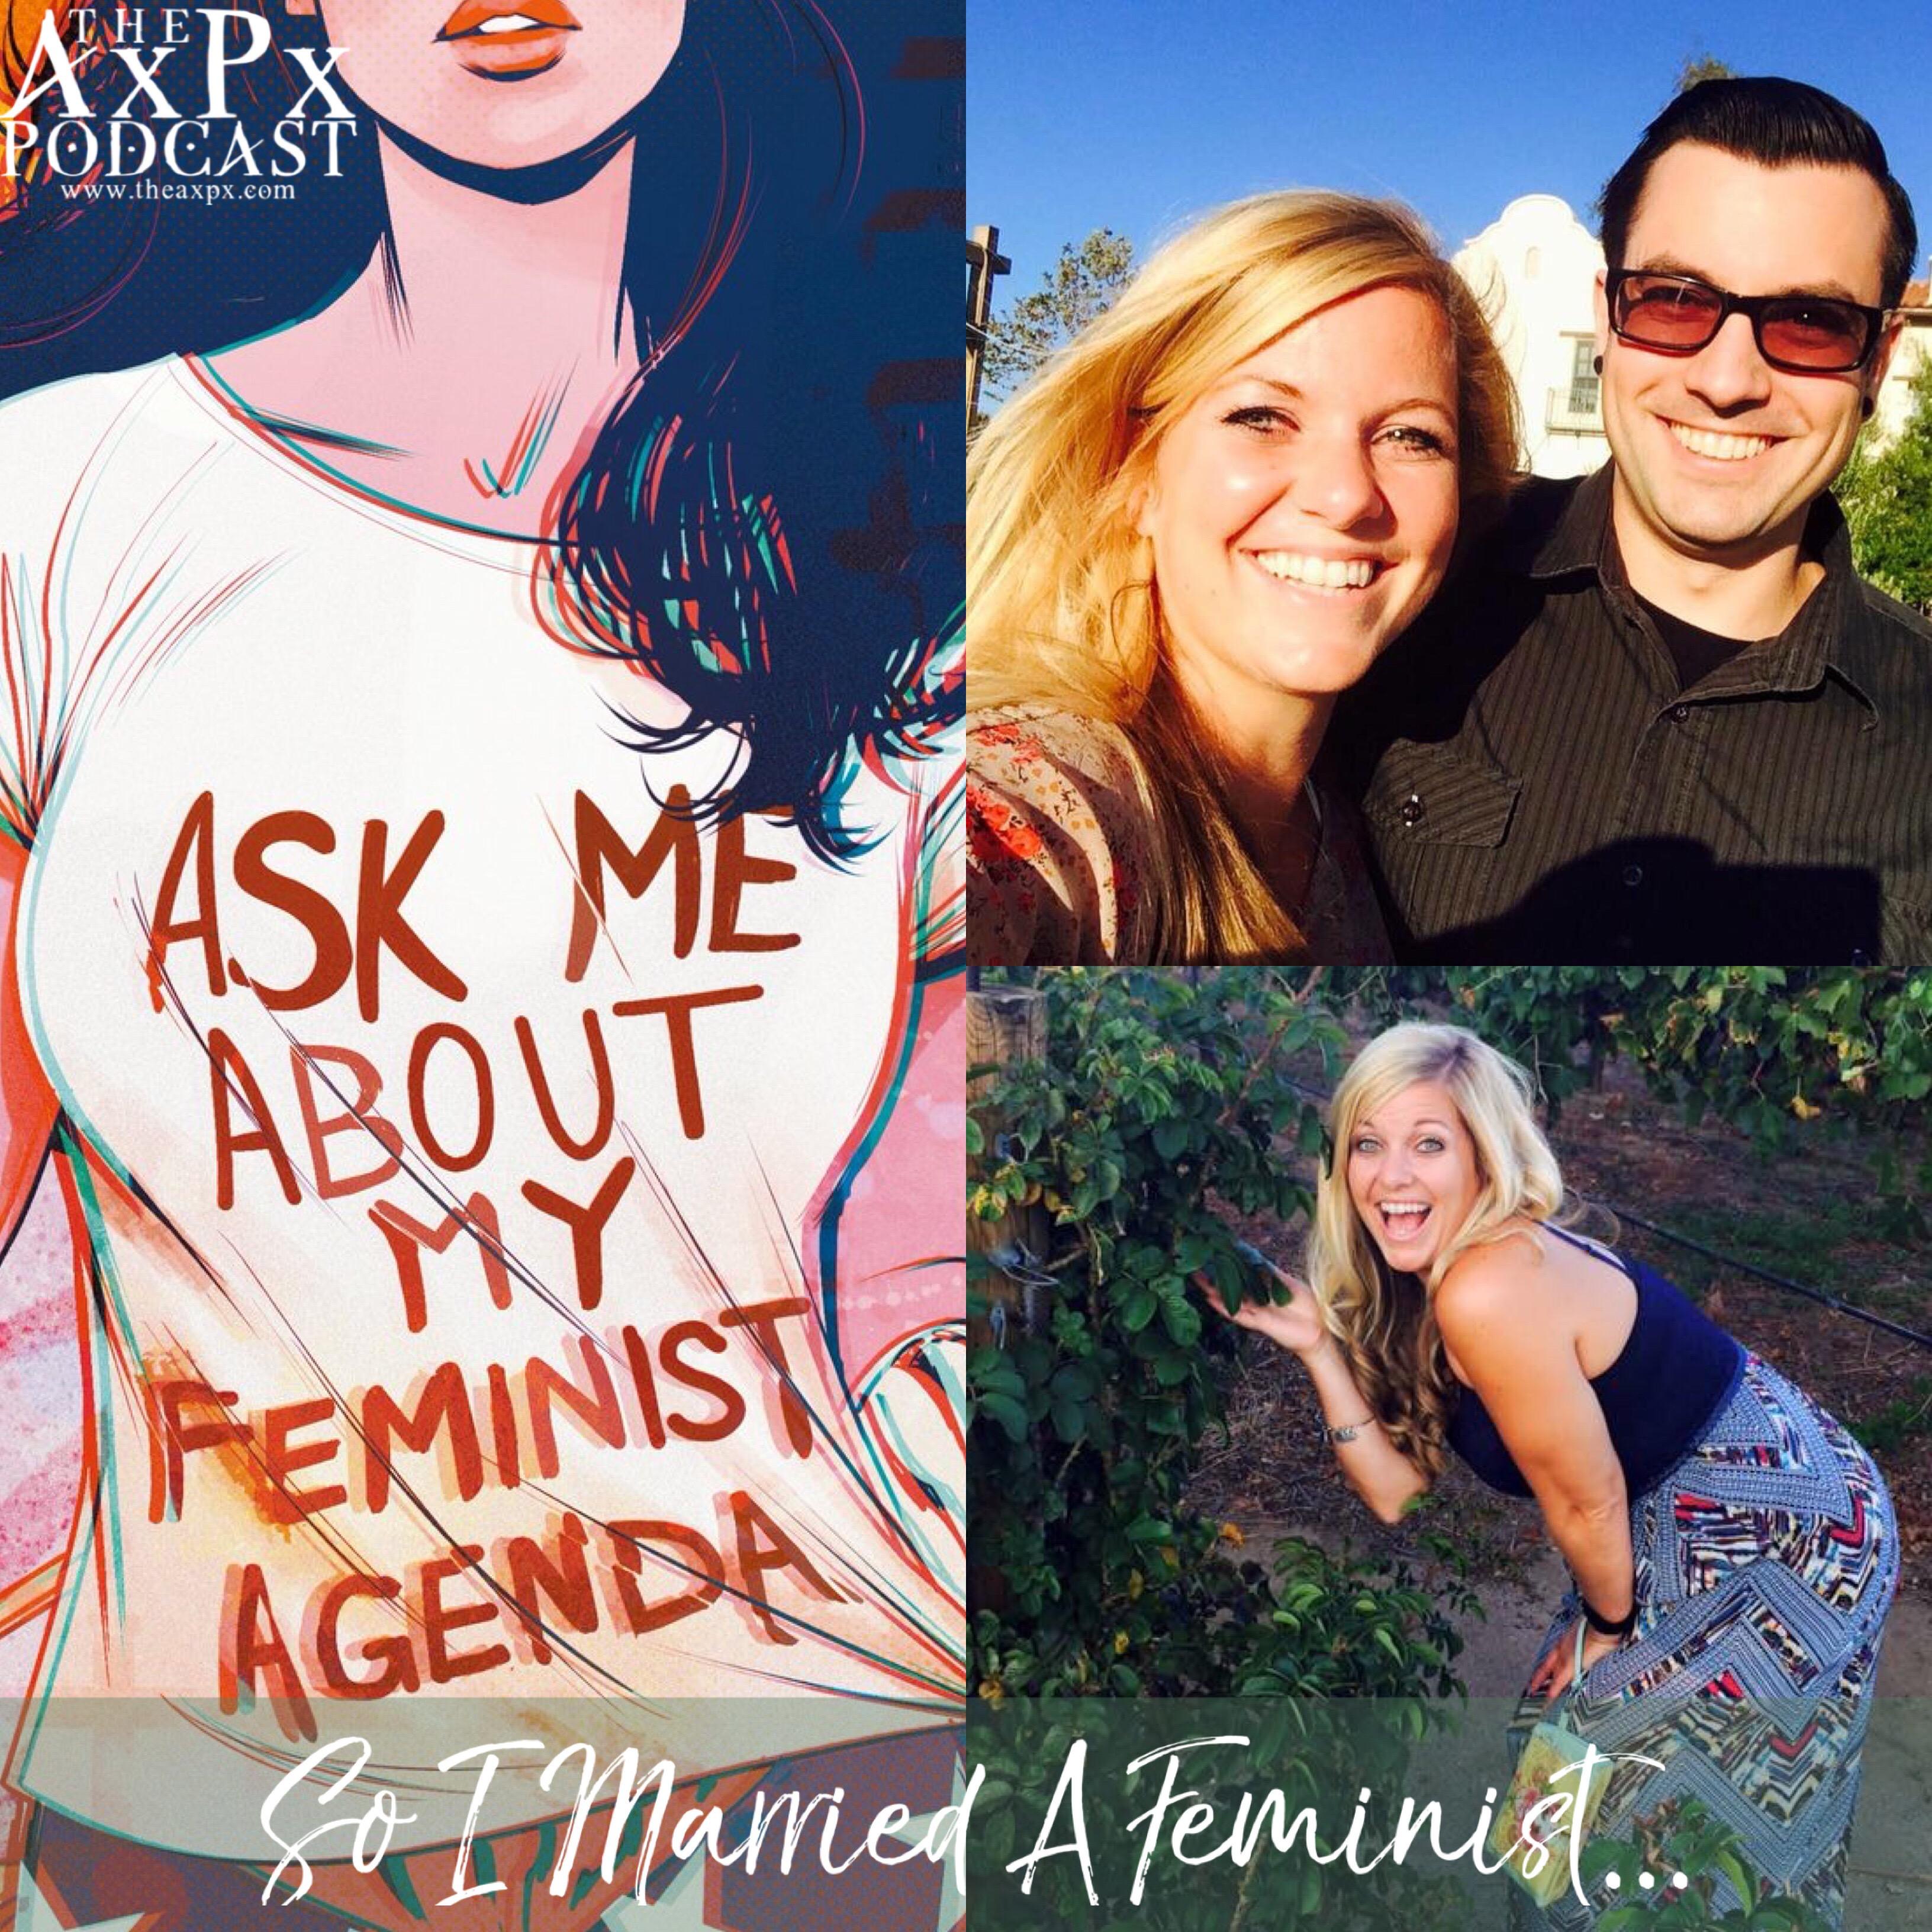 So I Married A Feminist…